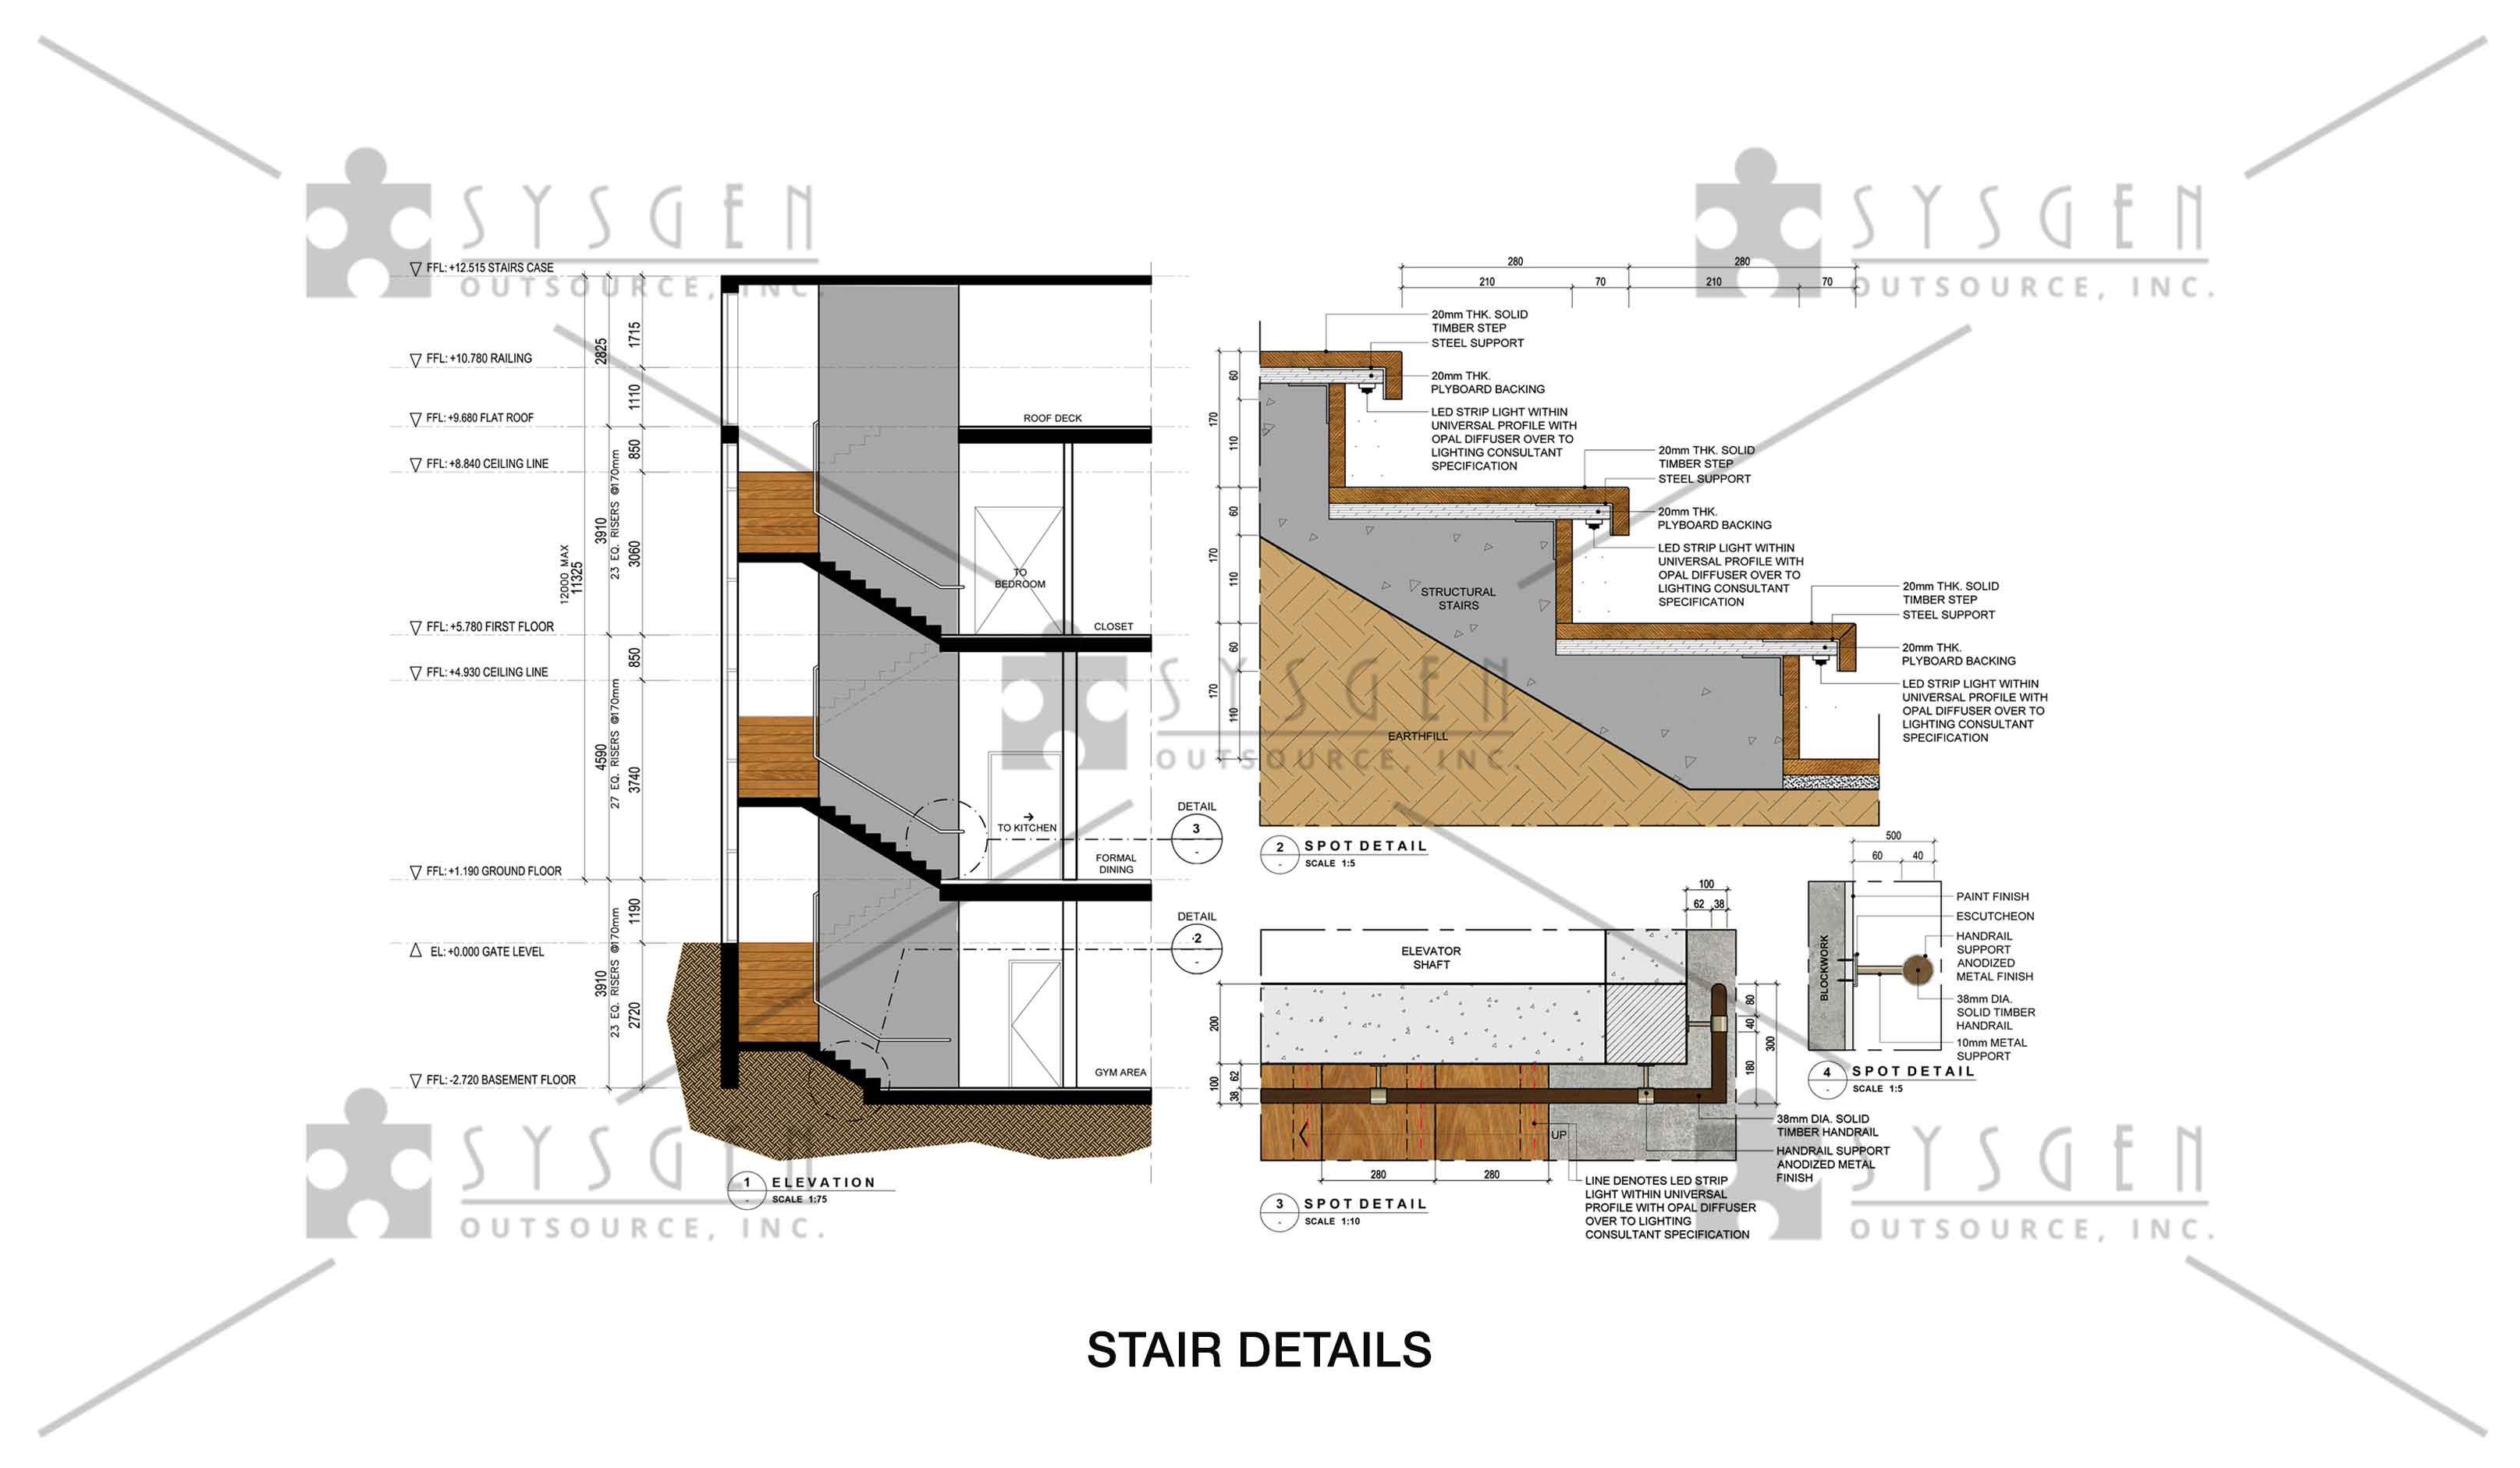 sysgen-outsource-cad-outsourcing-services-sketch-up-resi_villa-jm12